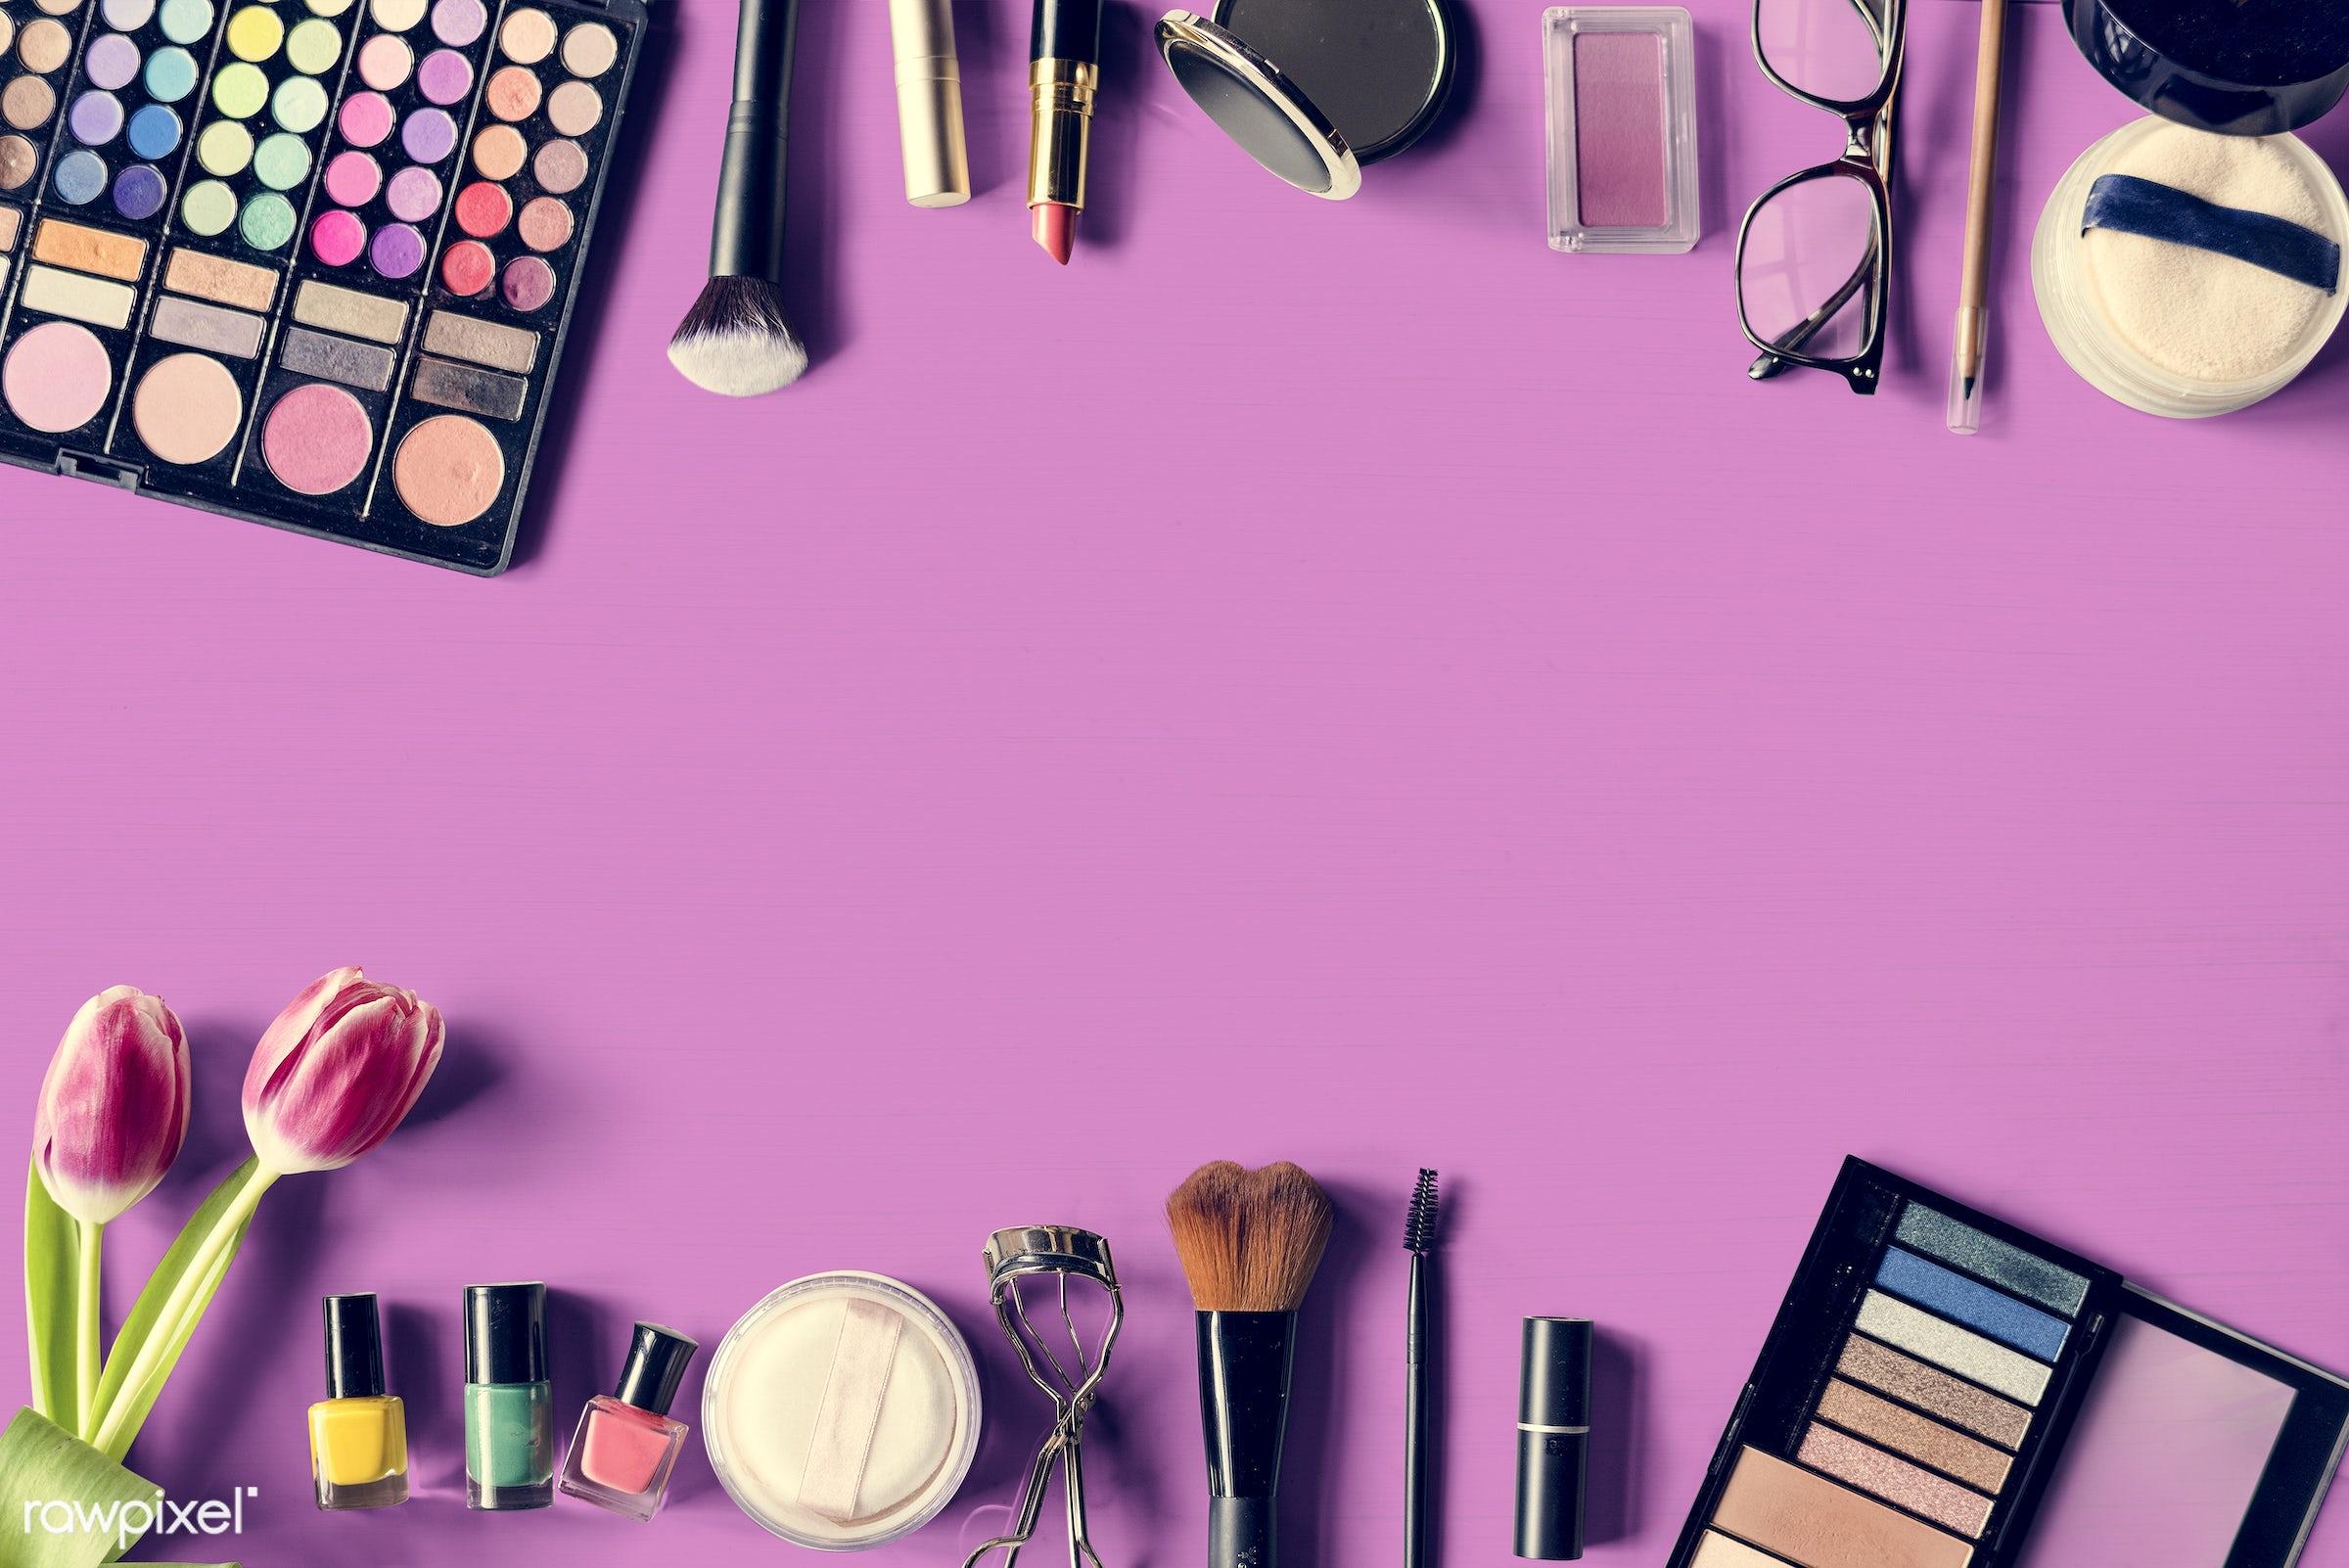 face, pastel, nail polish, glasses, makeup artist, colorful, makeup, set, treatment, palette, powder, blusher, beauty,...